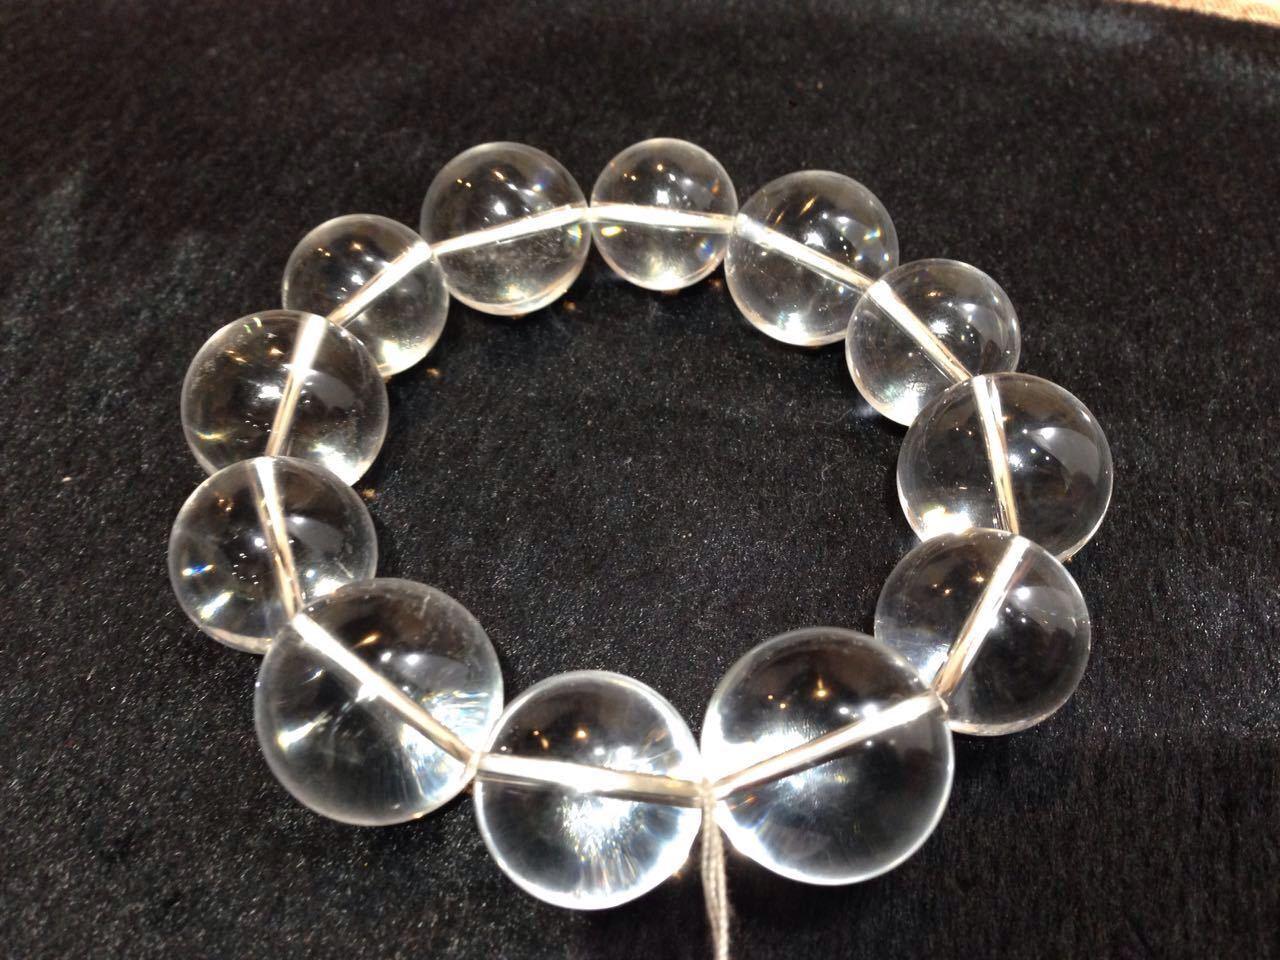 18mm Round Shape Crystal Quartz Stretch Bracelet, 7.5